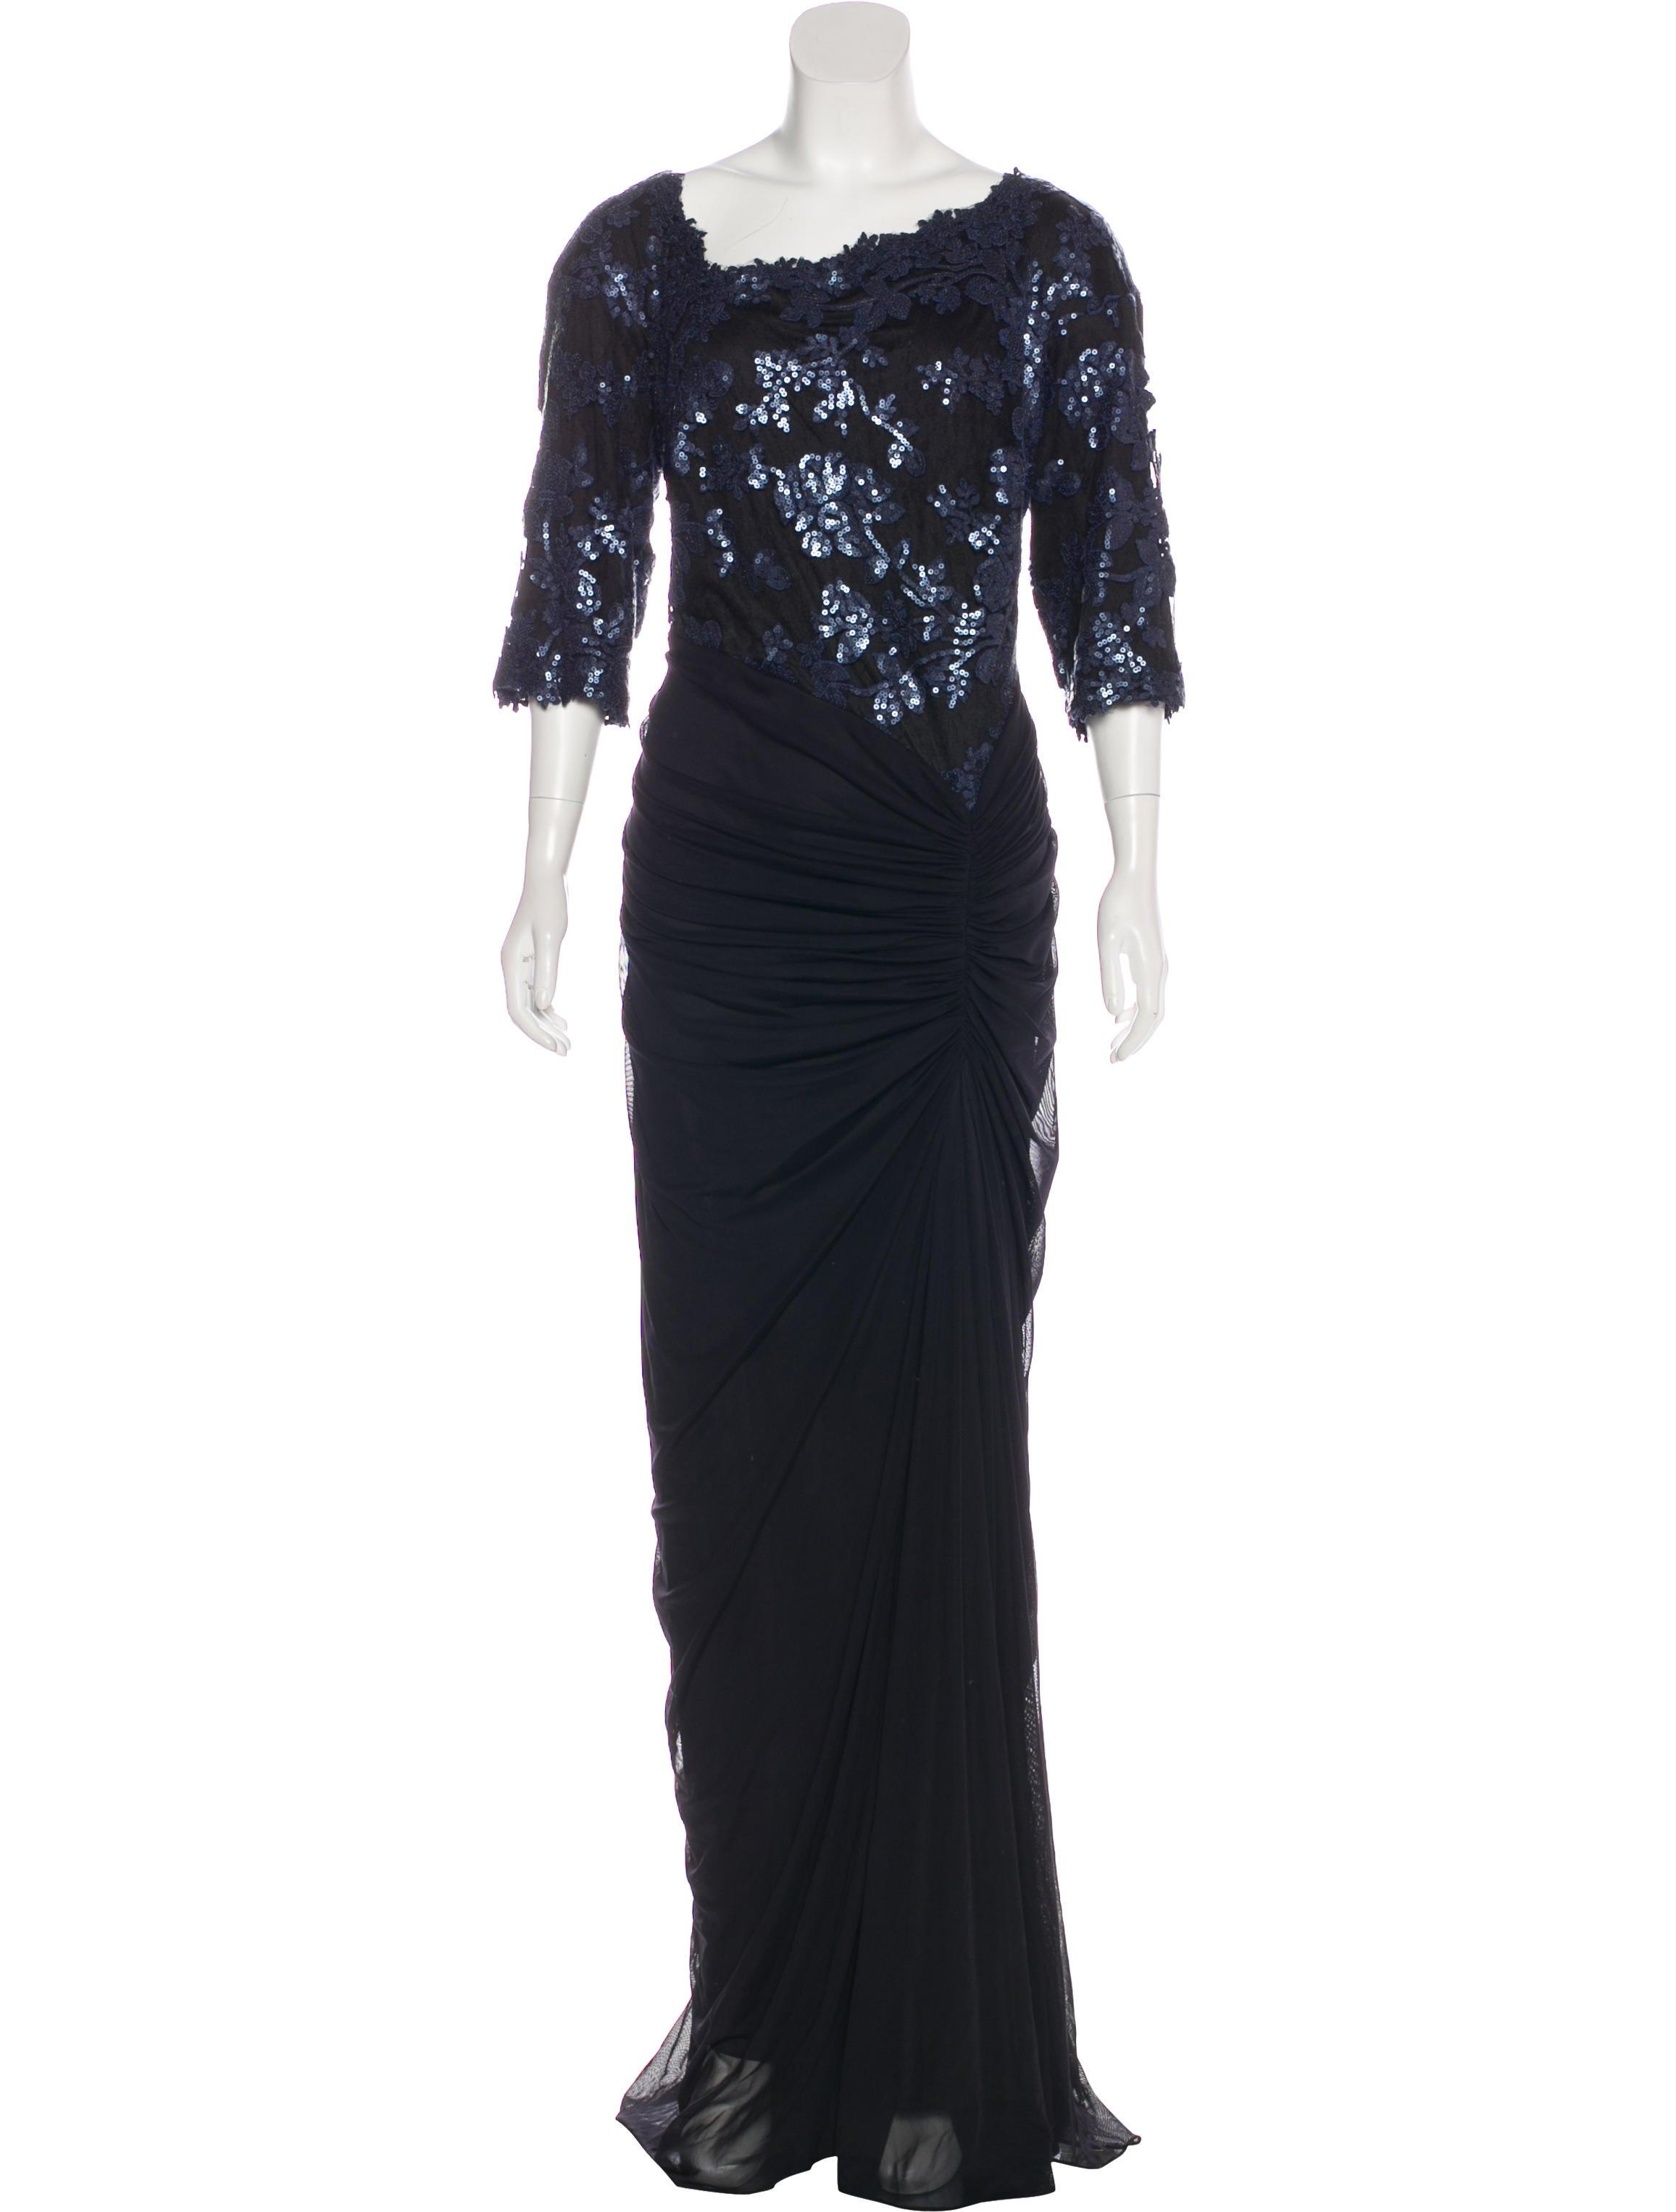 Tadashi Shoji Sequined Evening Dress - Clothing - WTASH20294 | The ...